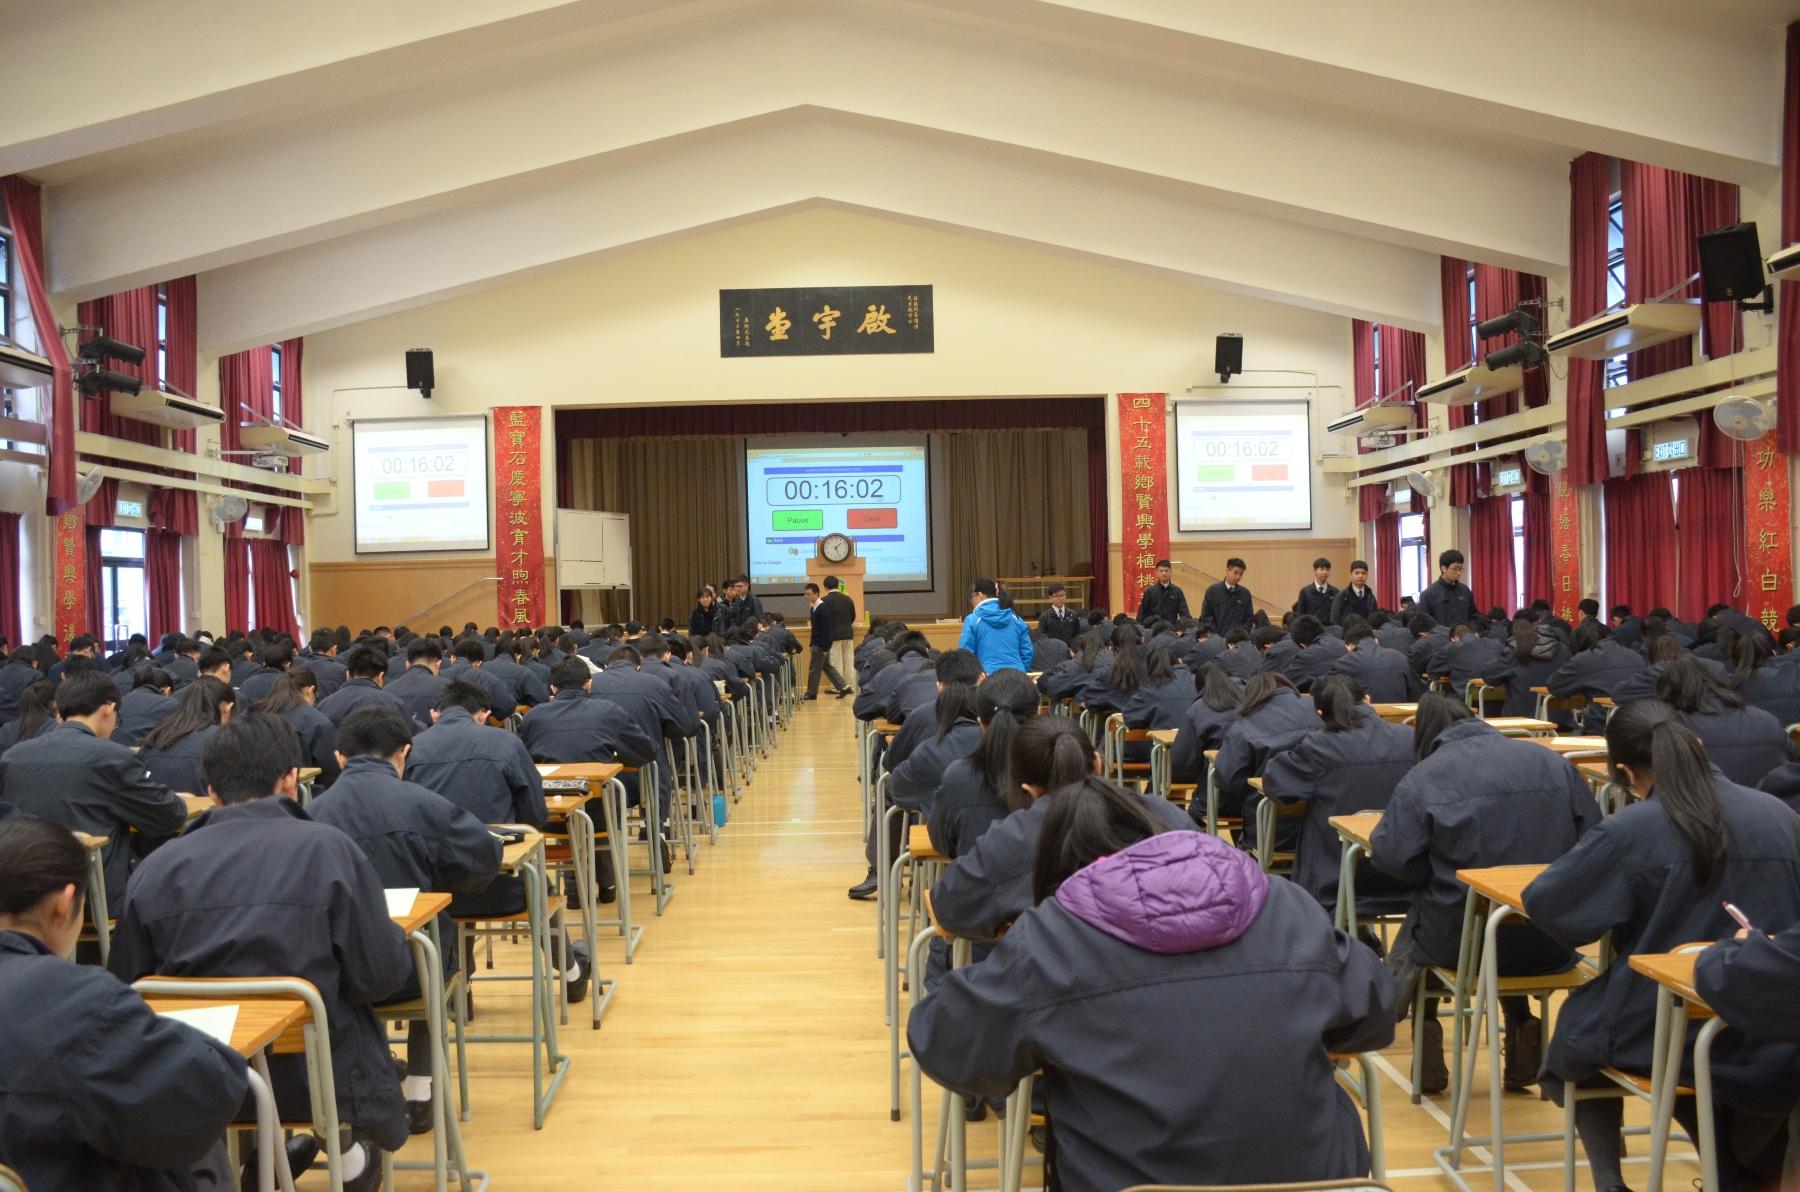 http://npc.edu.hk/sites/default/files/dsc_0508.jpg